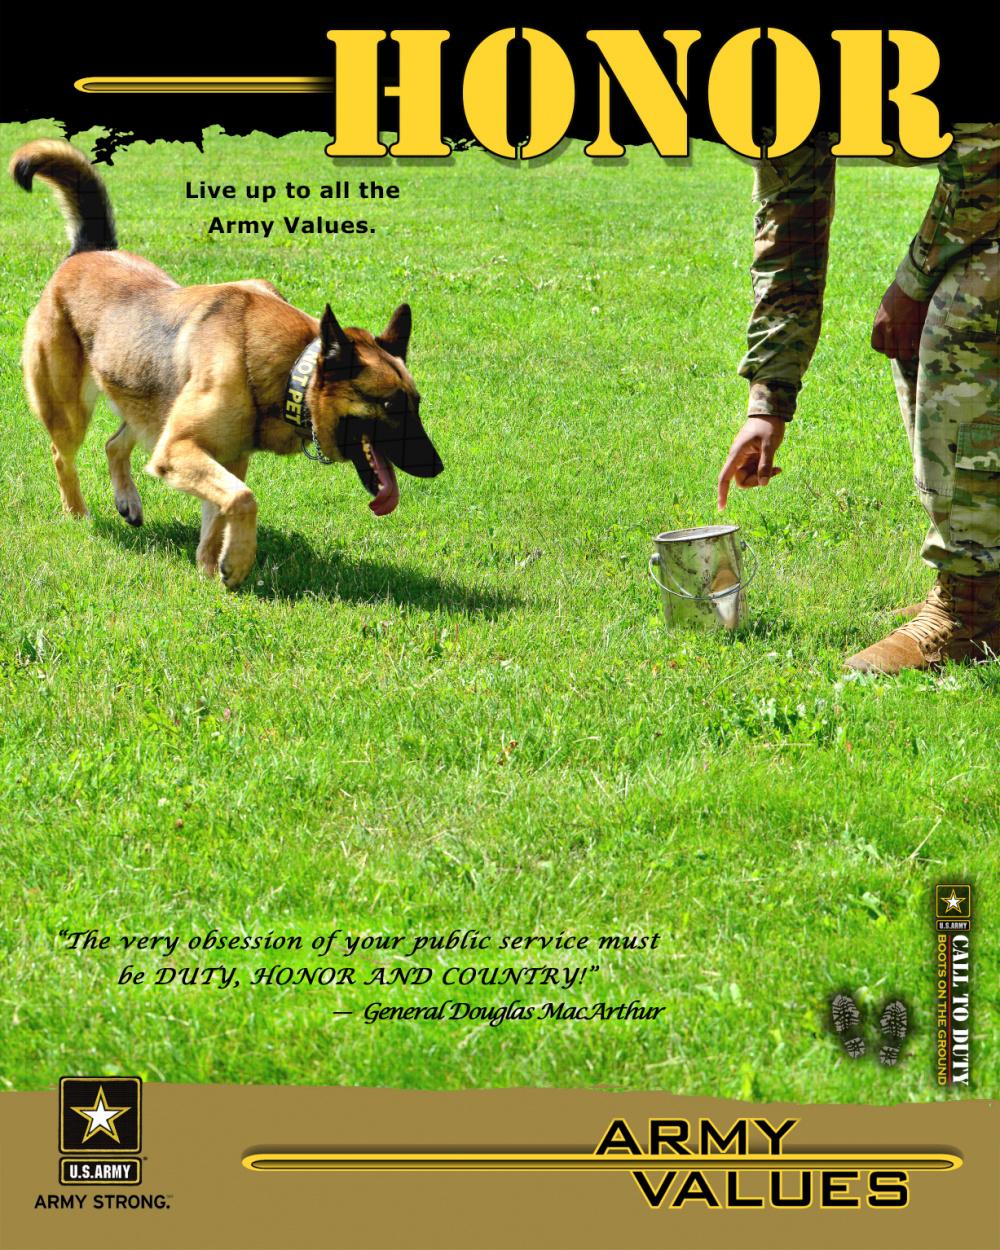 Army Values - Honor